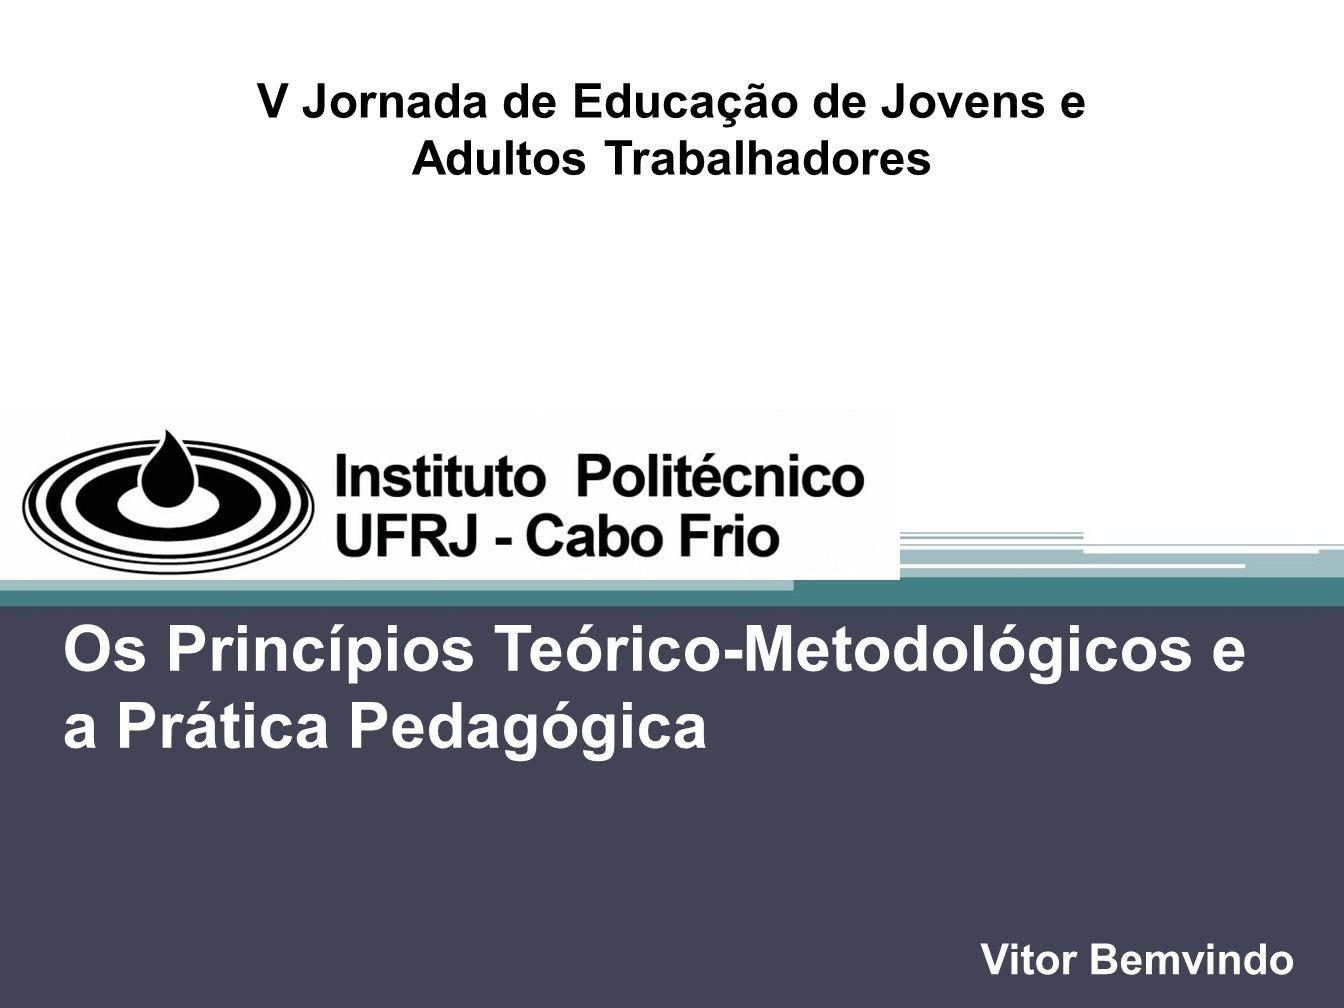 Os Princípios Teórico-Metodológicos e a Prática Pedagógica